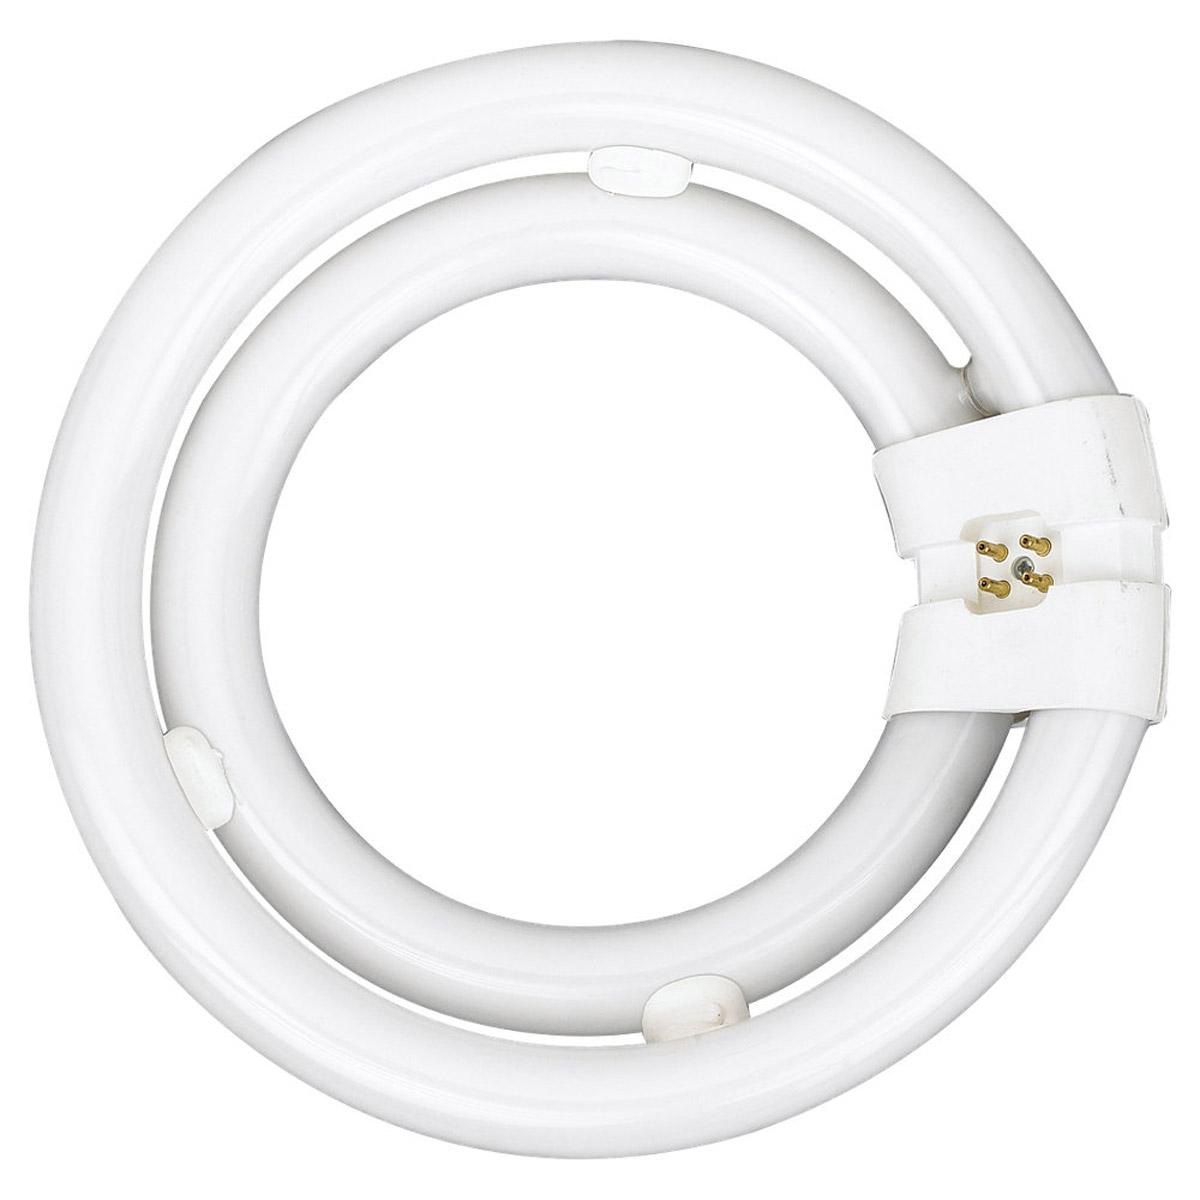 Sea Gull Lighting 2C55 - Double Circline Fluorescent Bulb 97043